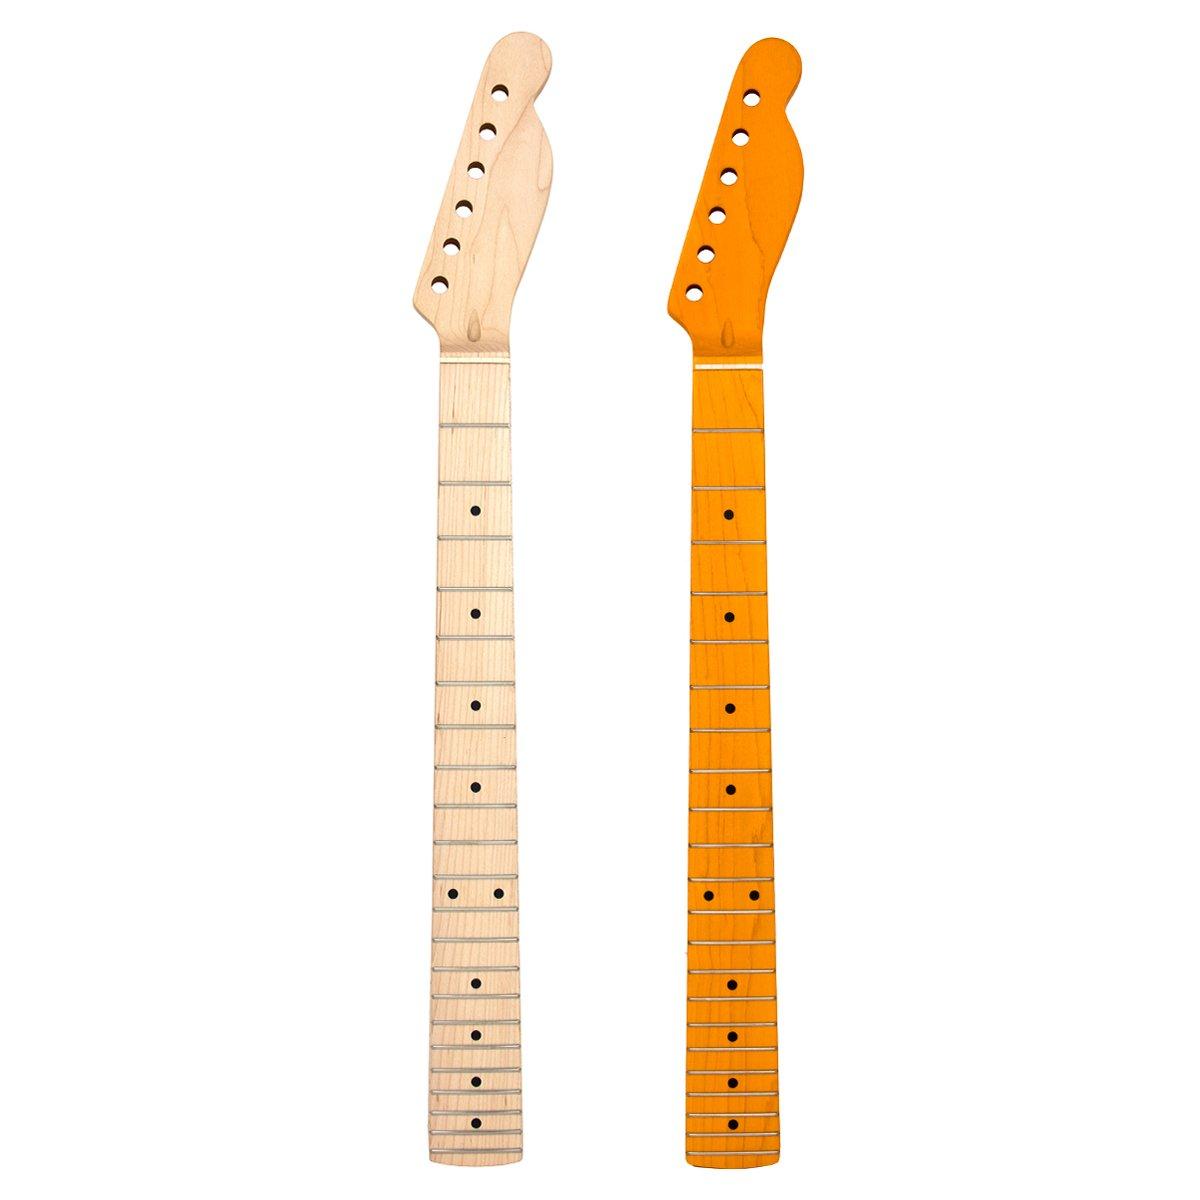 2pcs Electric Guitar Neck Replacement Maple 22 Fret